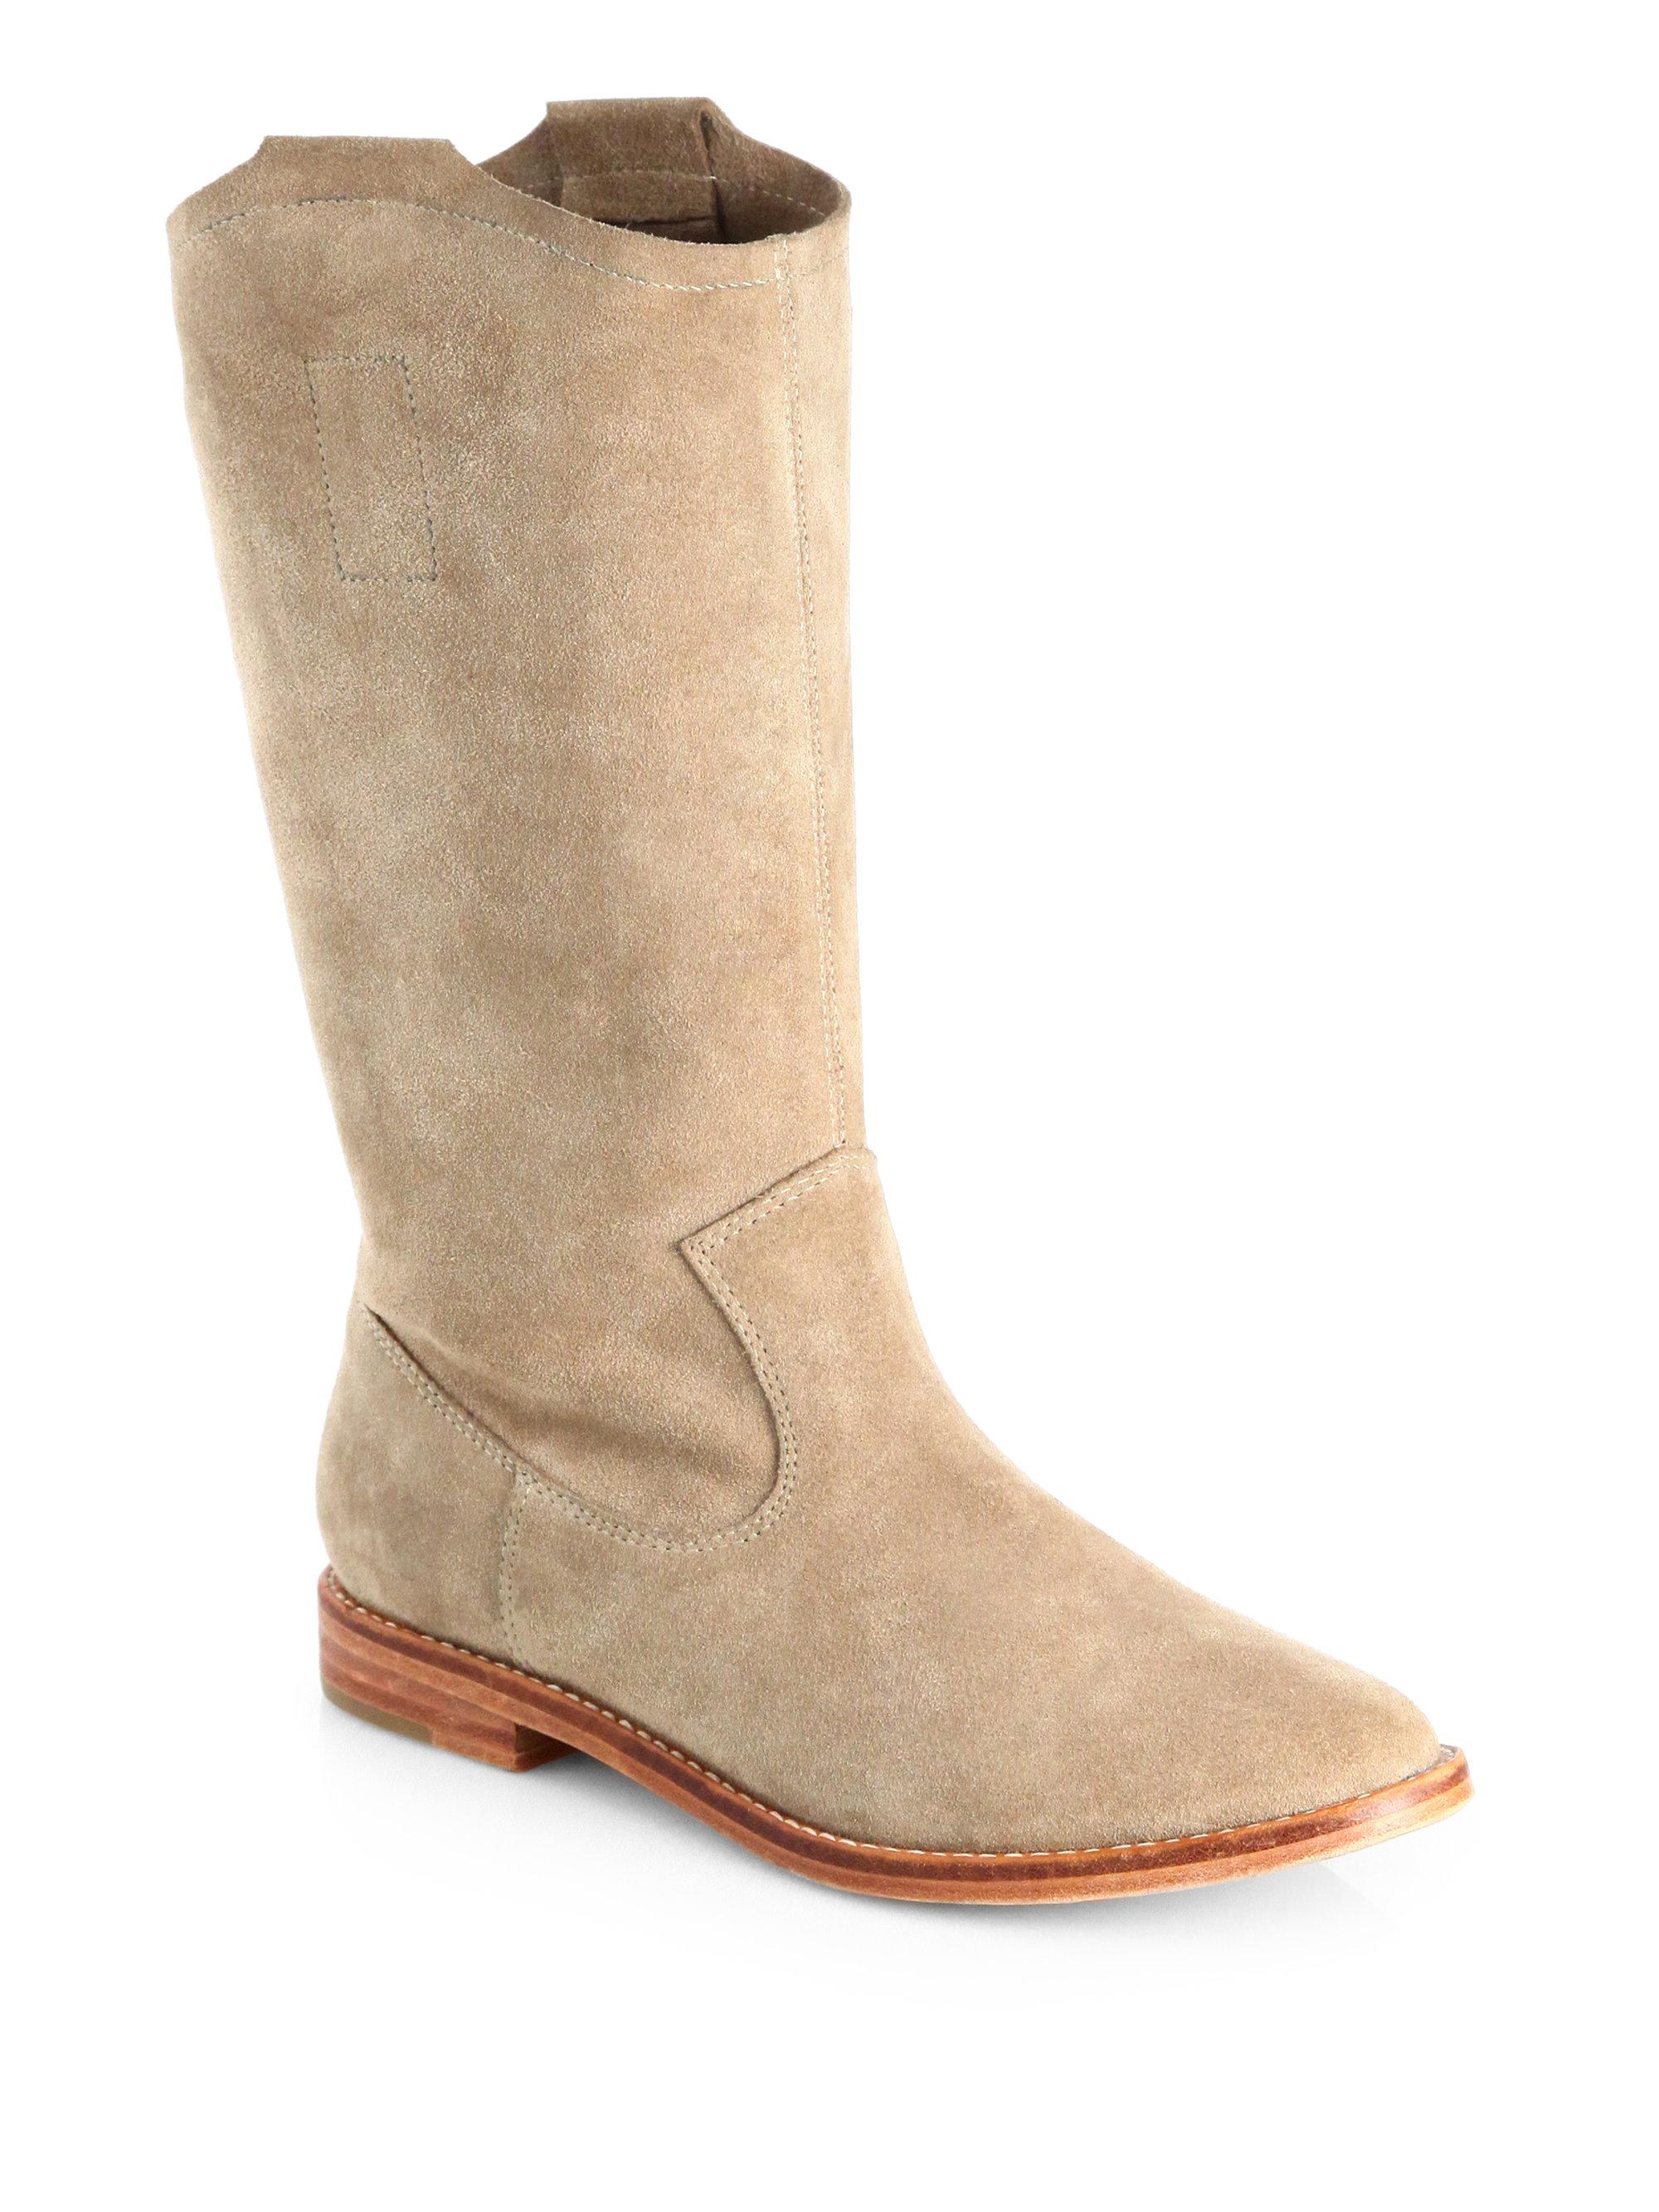 joie ogden slouchy suede boots in beige cement lyst